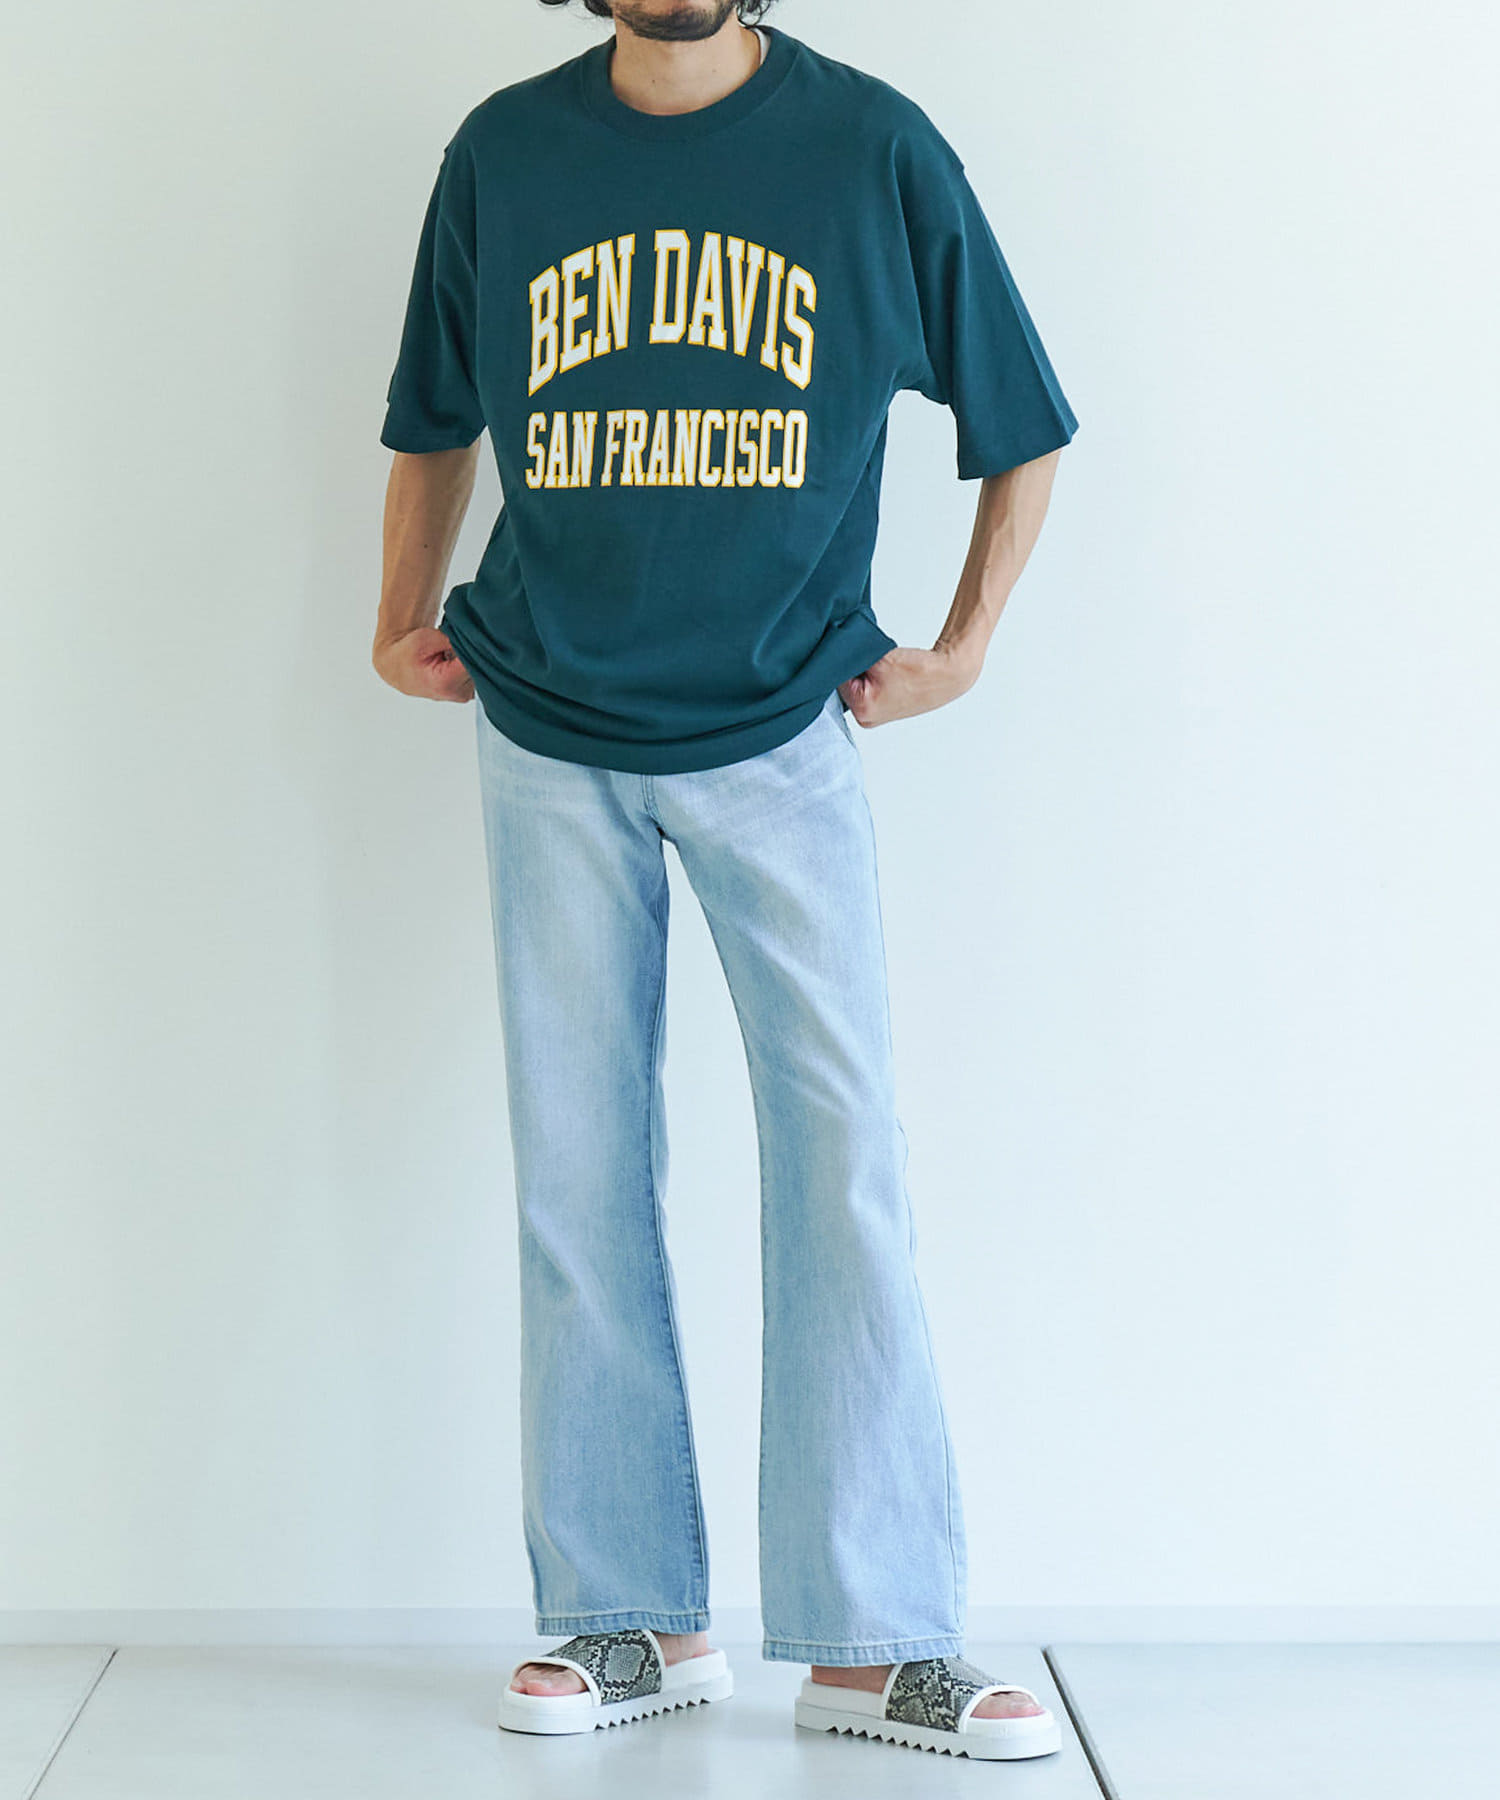 CPCM(シーピーシーエム) 【BEN DAVIS】 カレッジロゴTシャツ【オンラインストア限定商品】